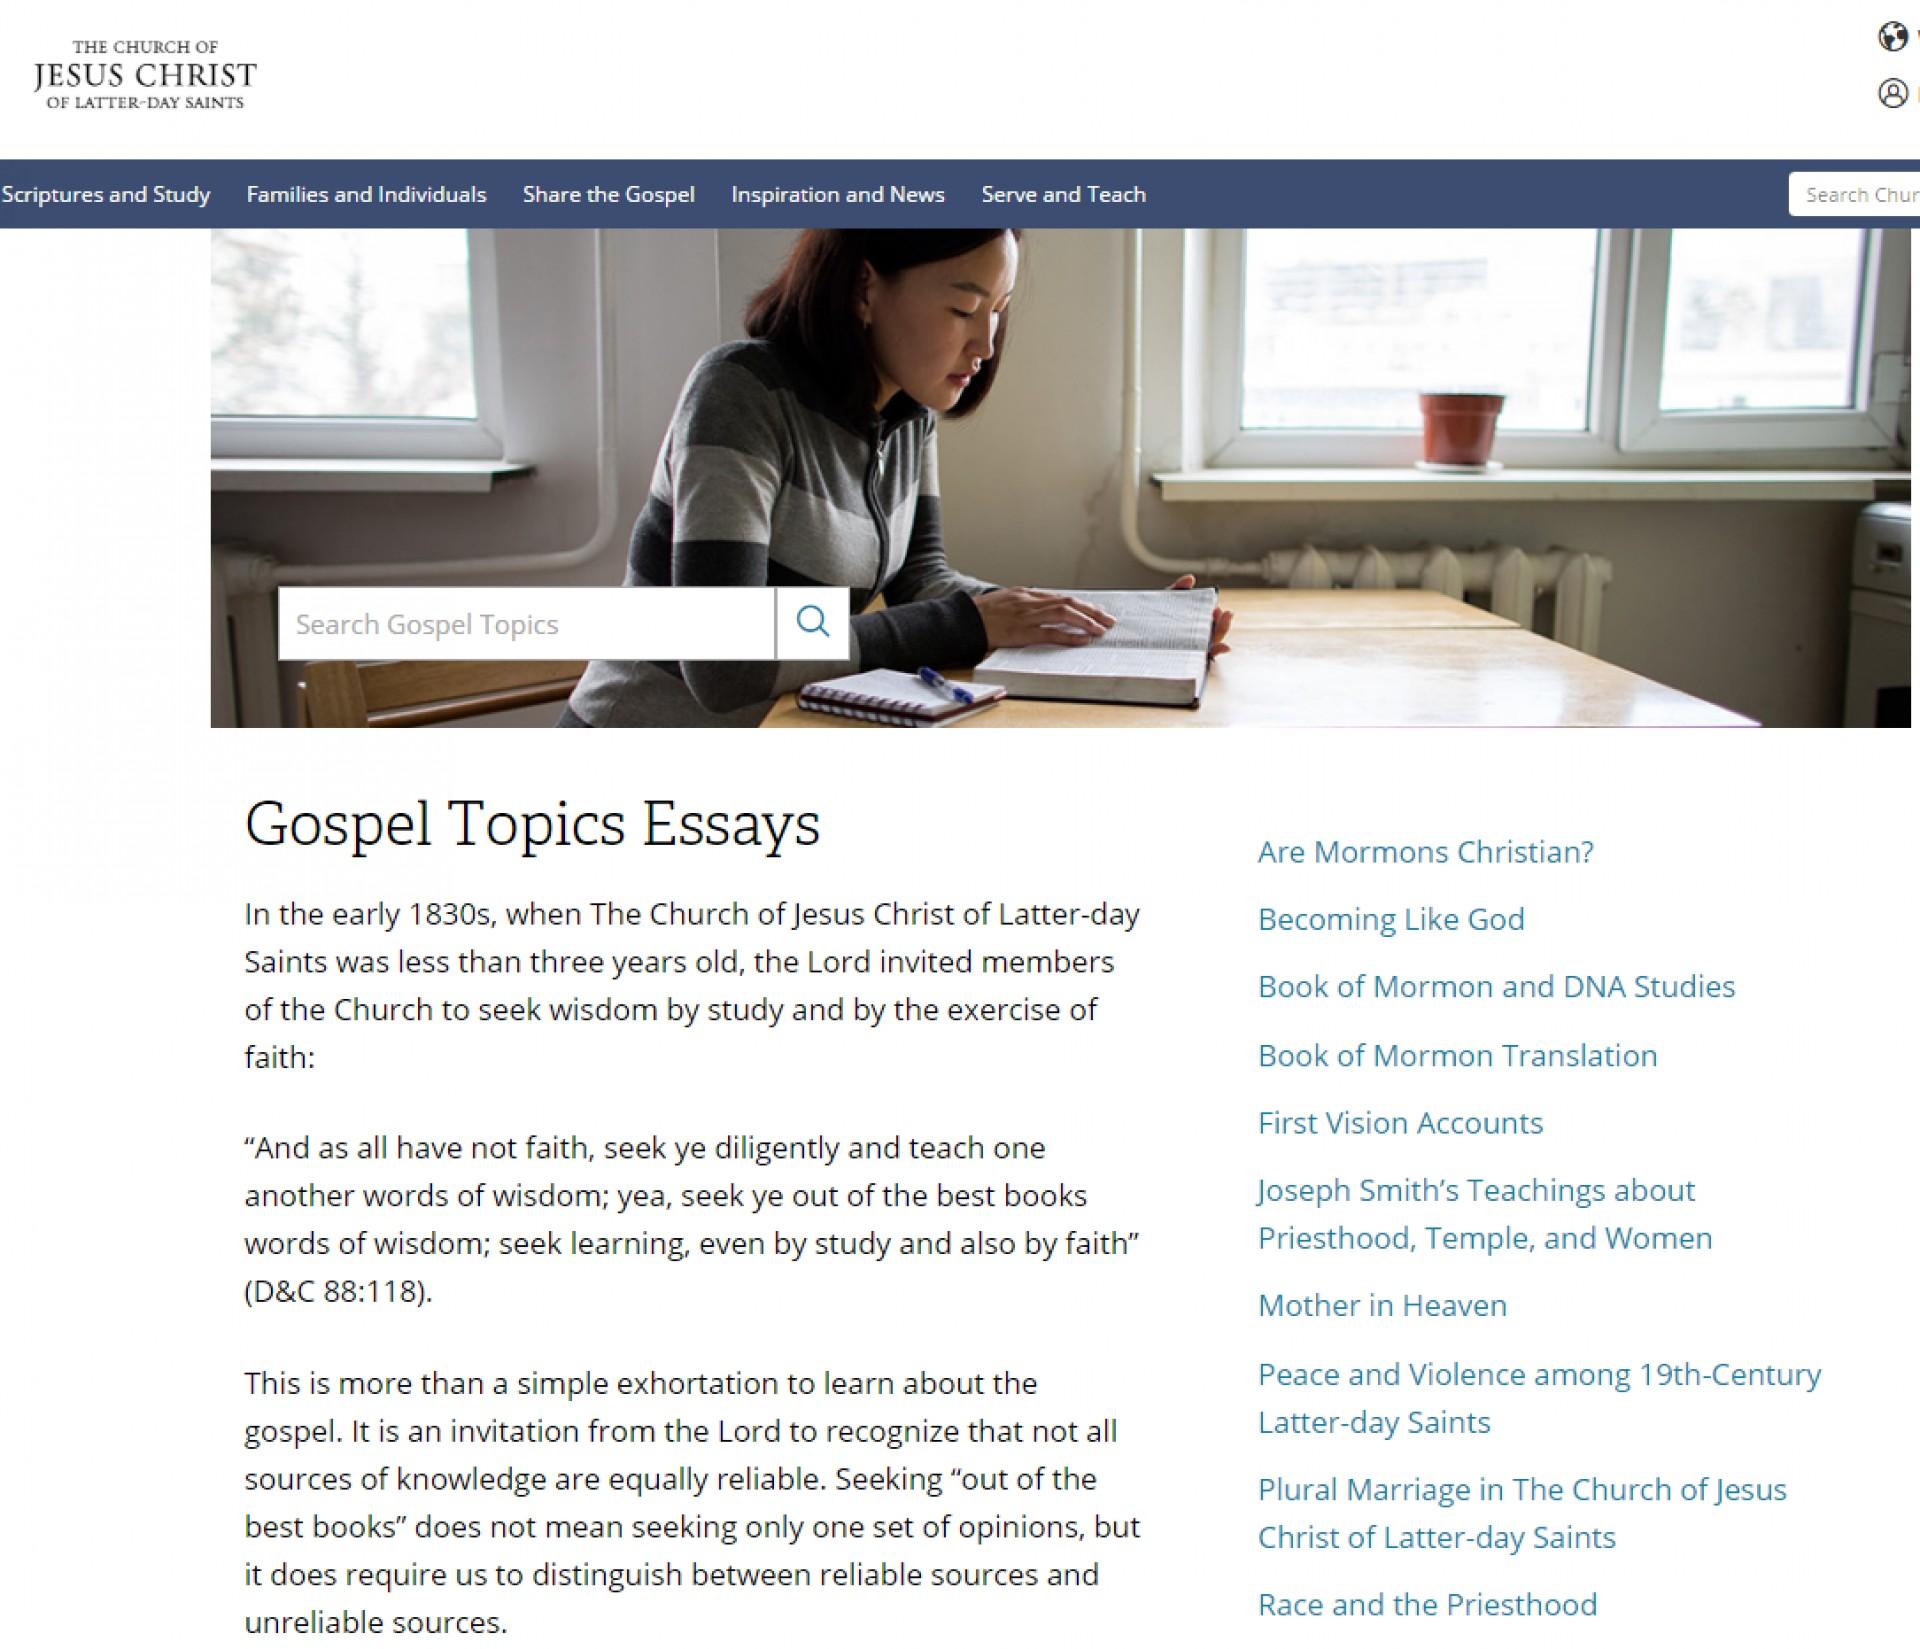 008 23 0556 Essay Example Gospel Topics Outstanding Essays Book Of Abraham Pdf Mormon Translation 1920